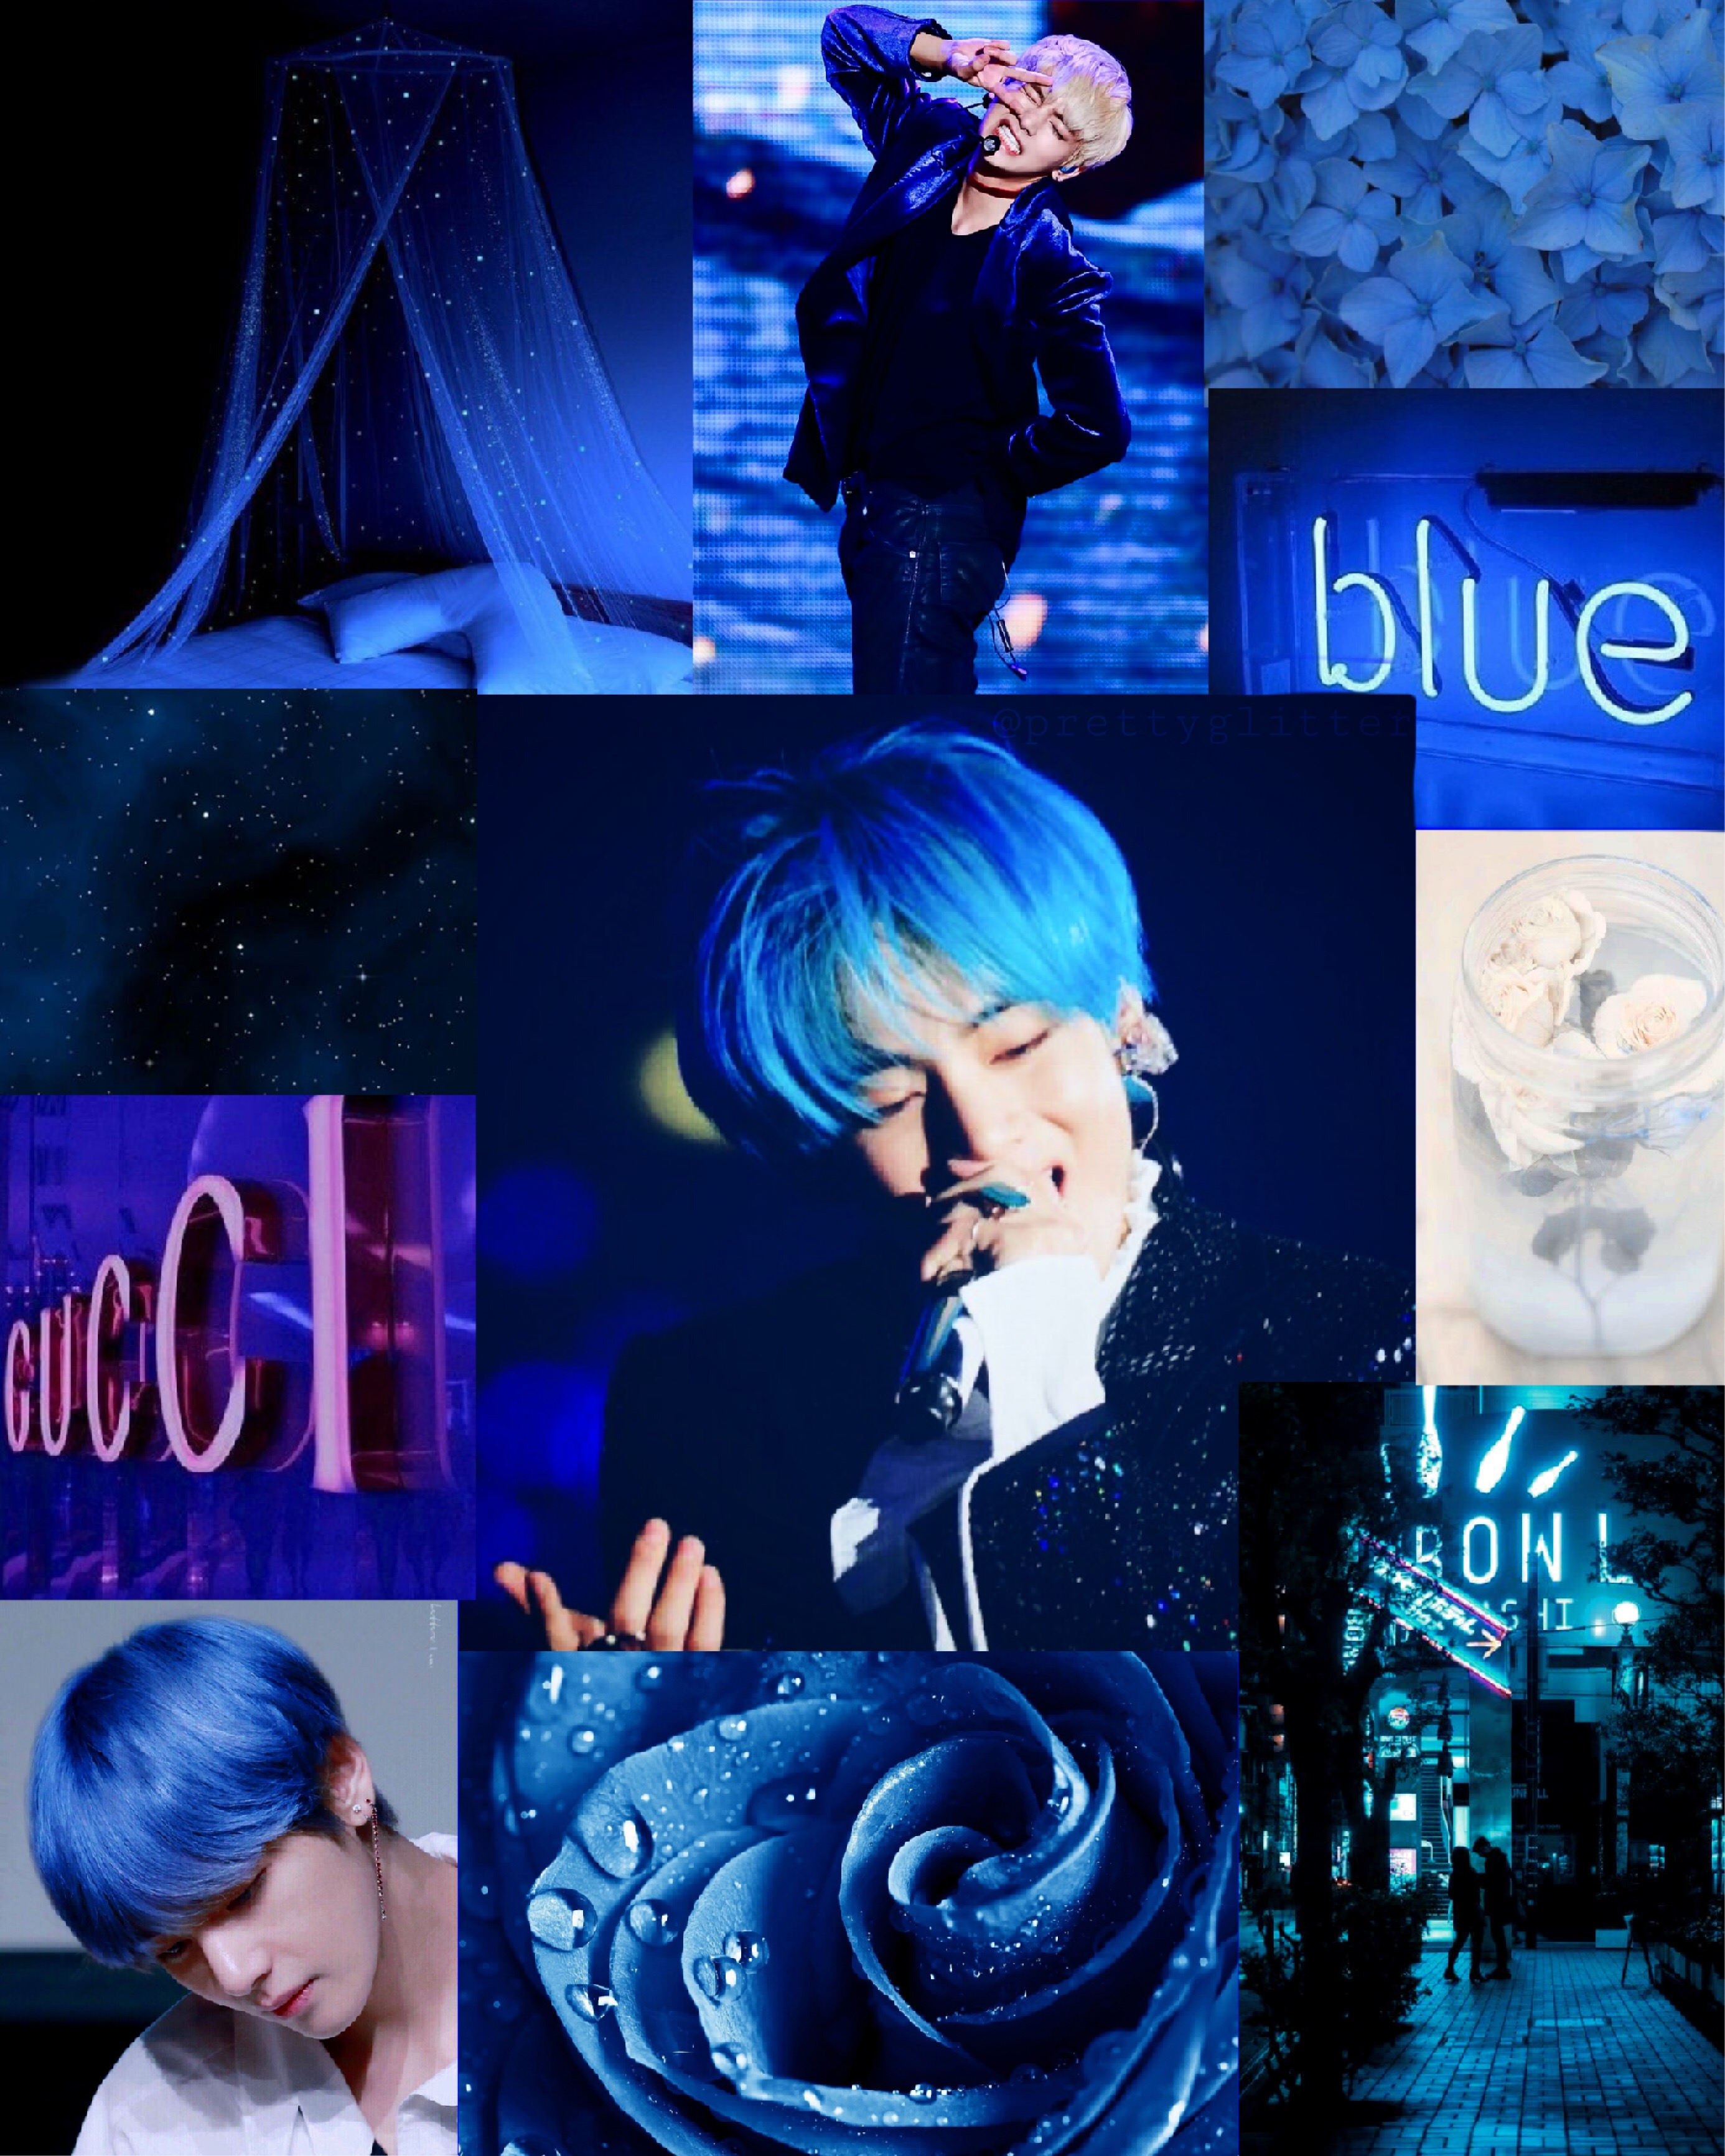 Kimtaehyung Vbts Bluehair Image By 𝓛 Blm